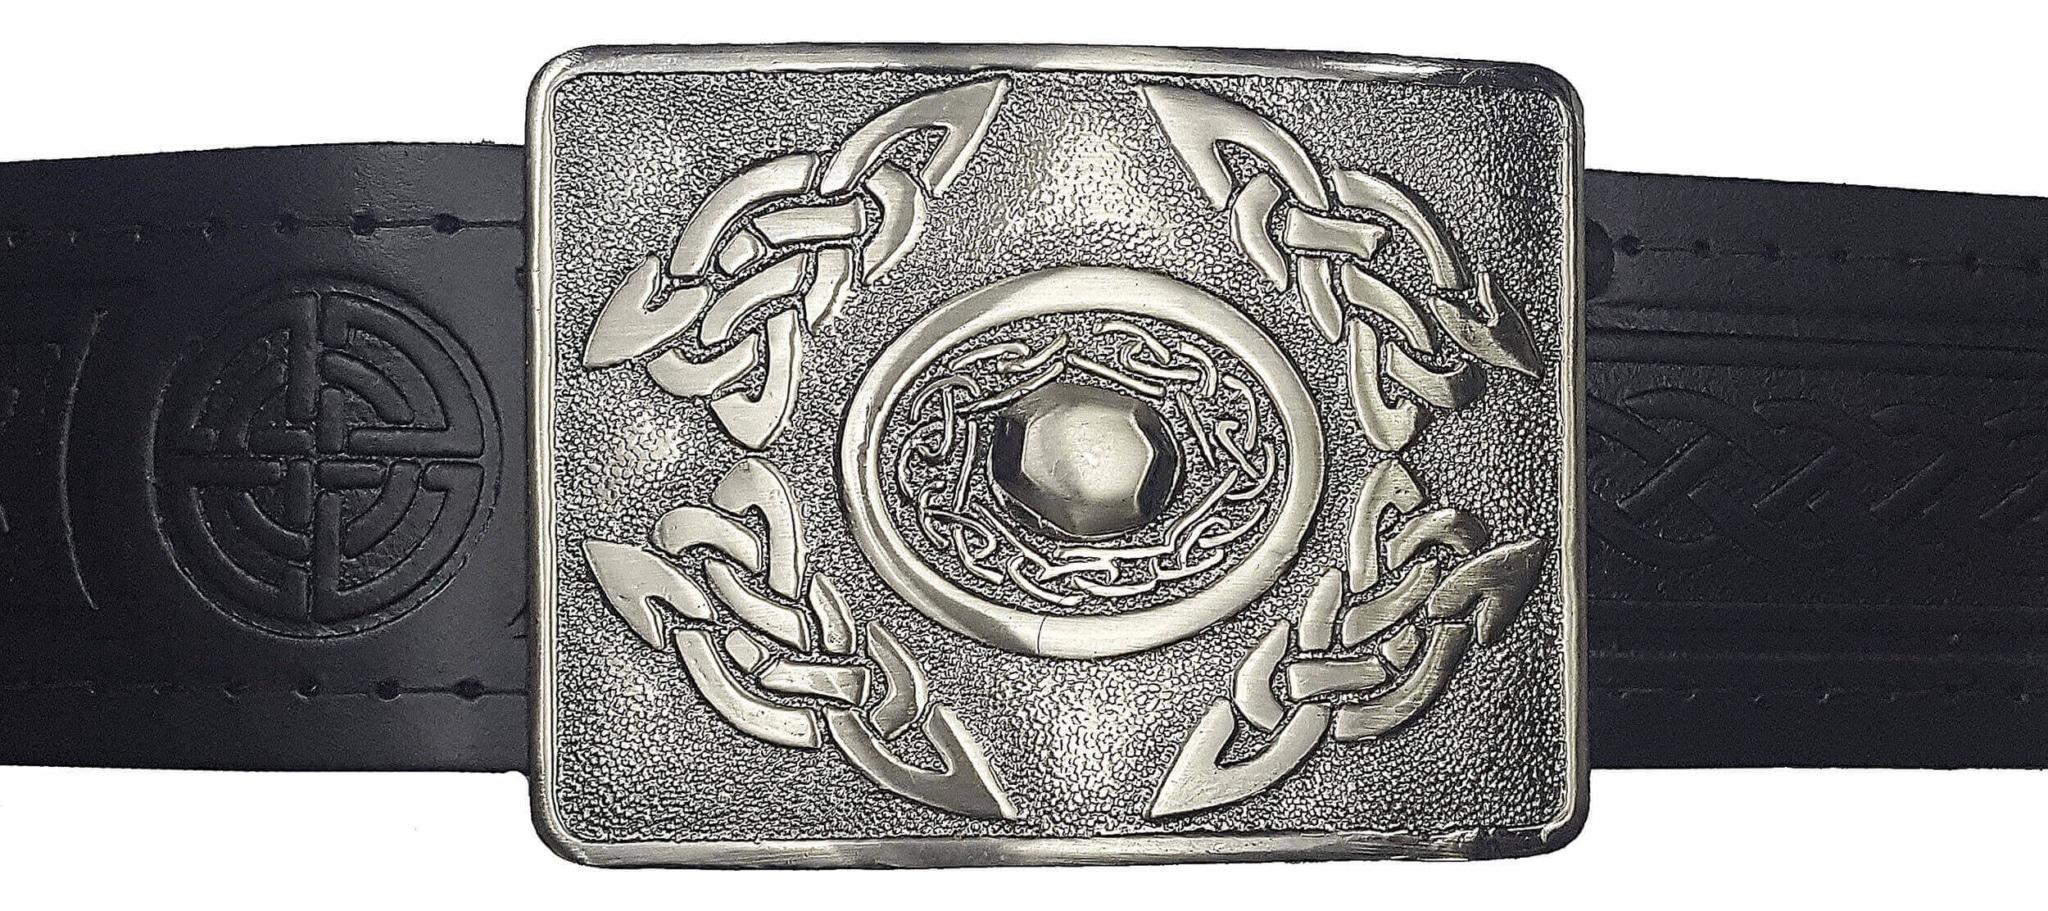 Leather Thistle Design Kilt Belt Black Scottish Chrome Finish Celtic Buckle